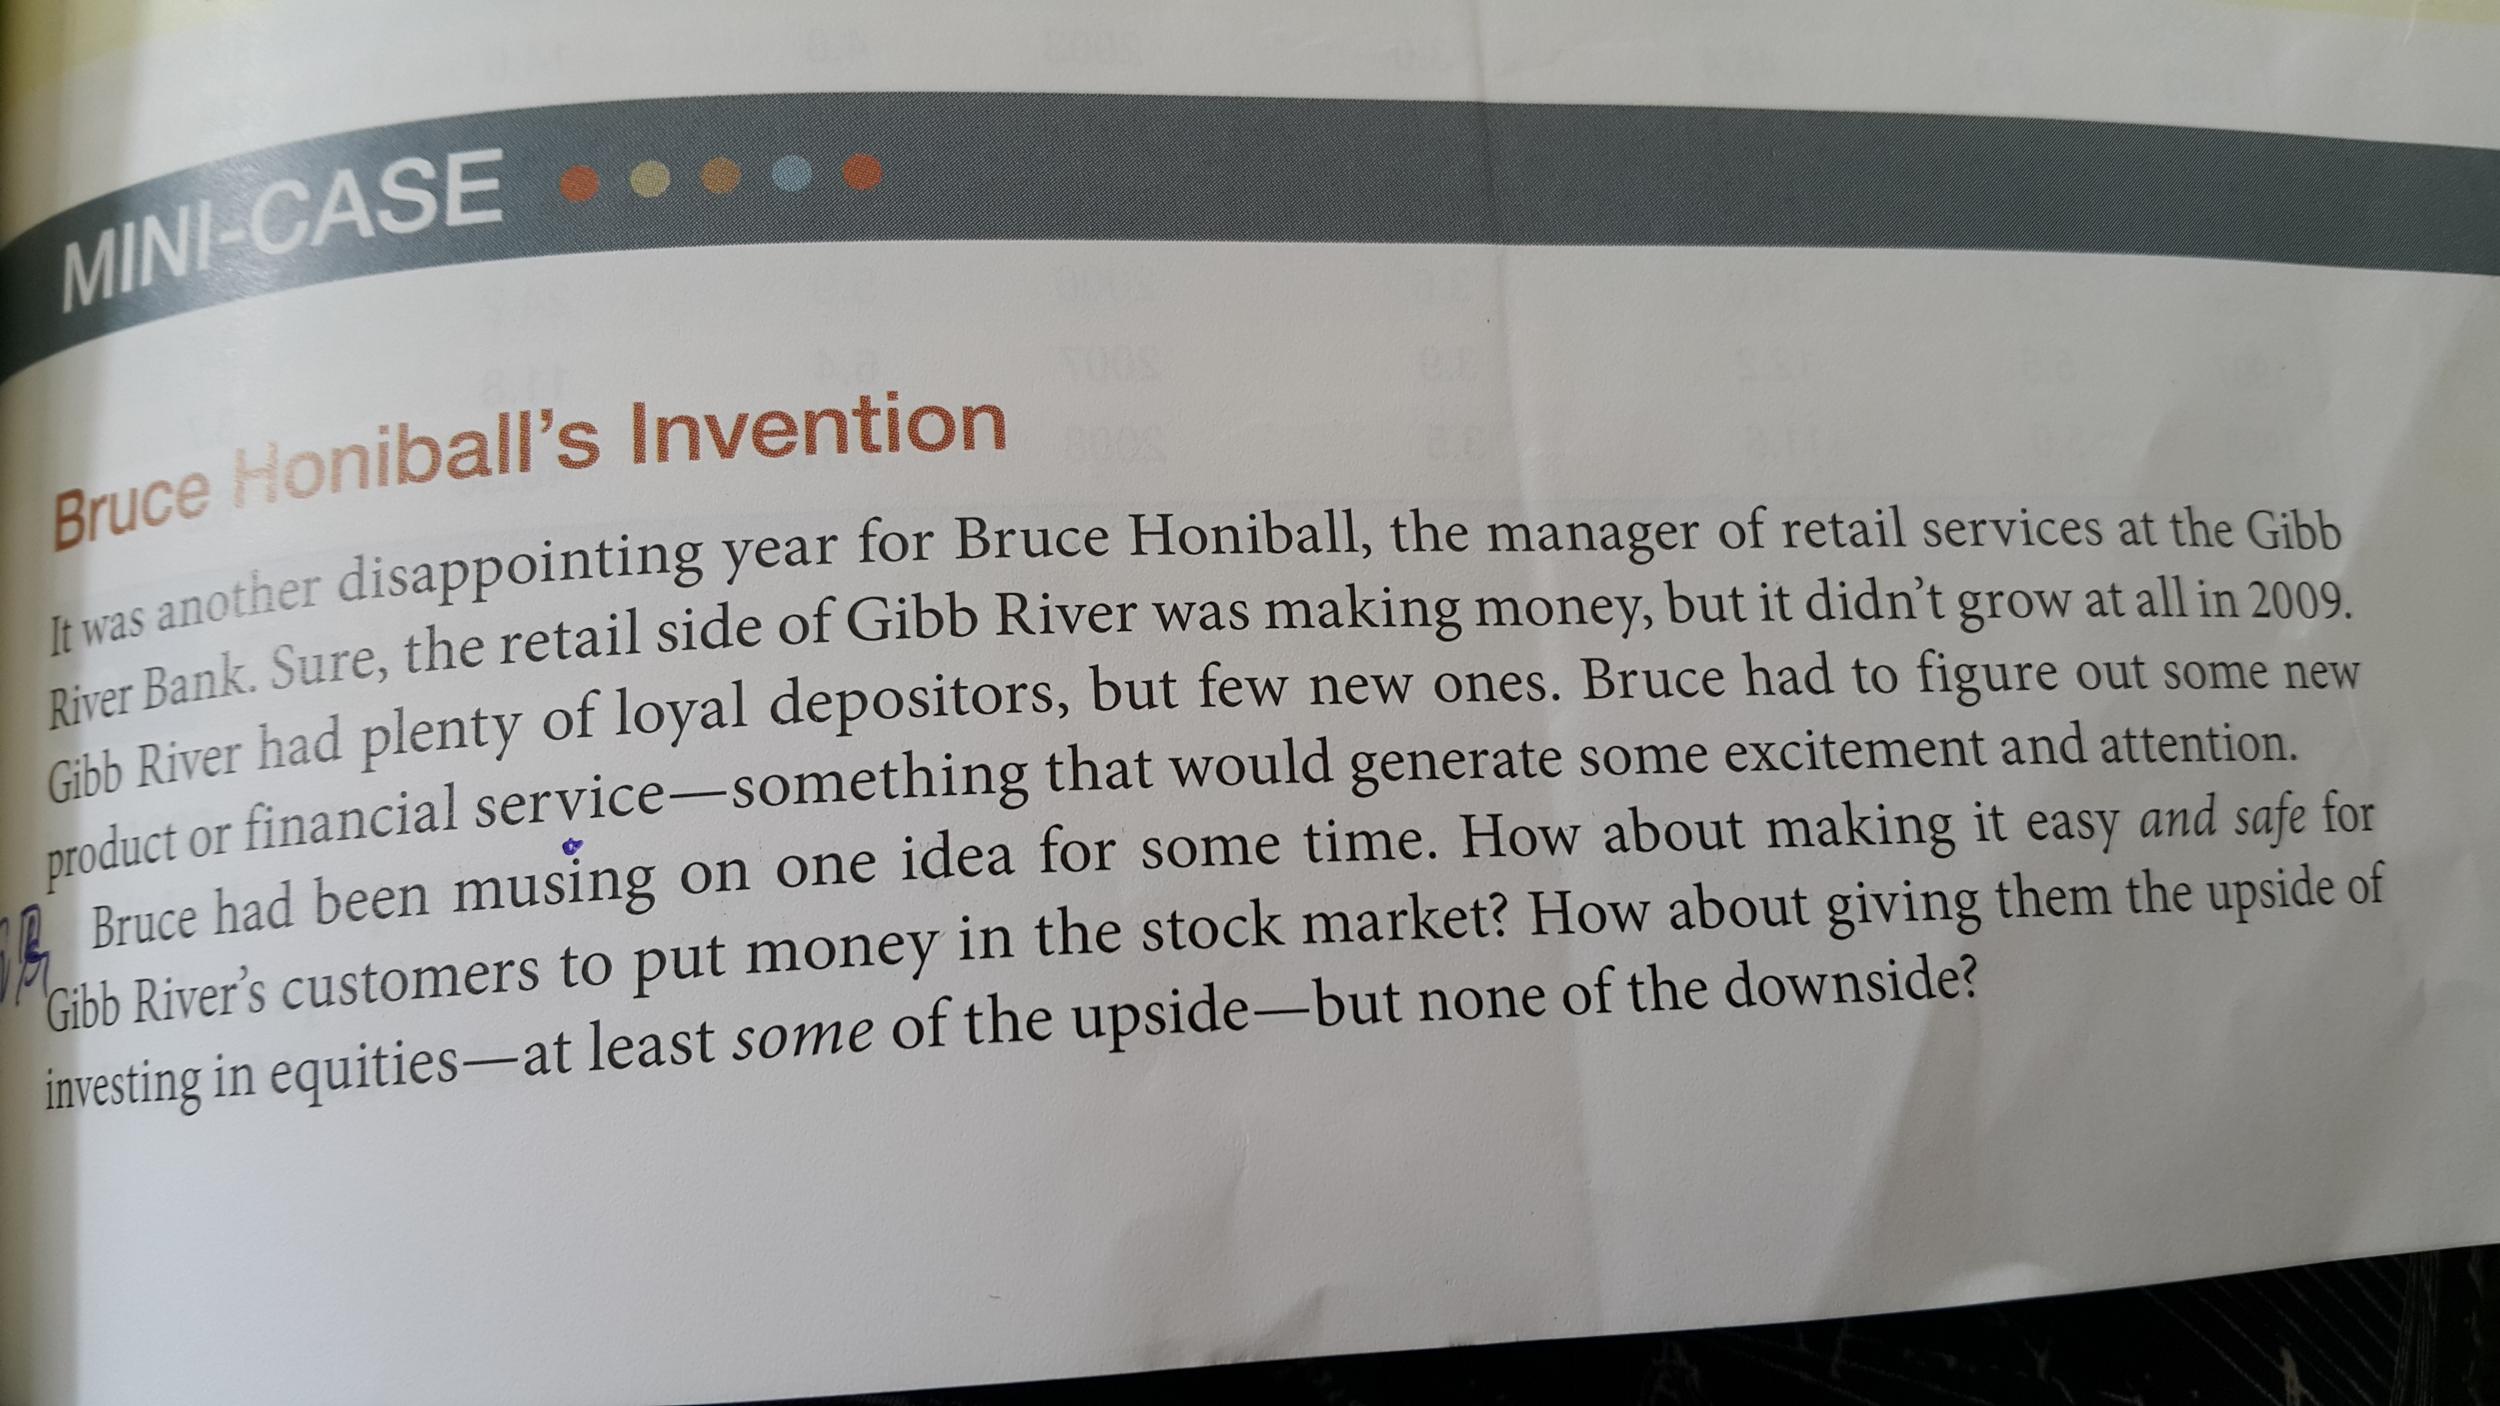 bruce honiball minicase solution